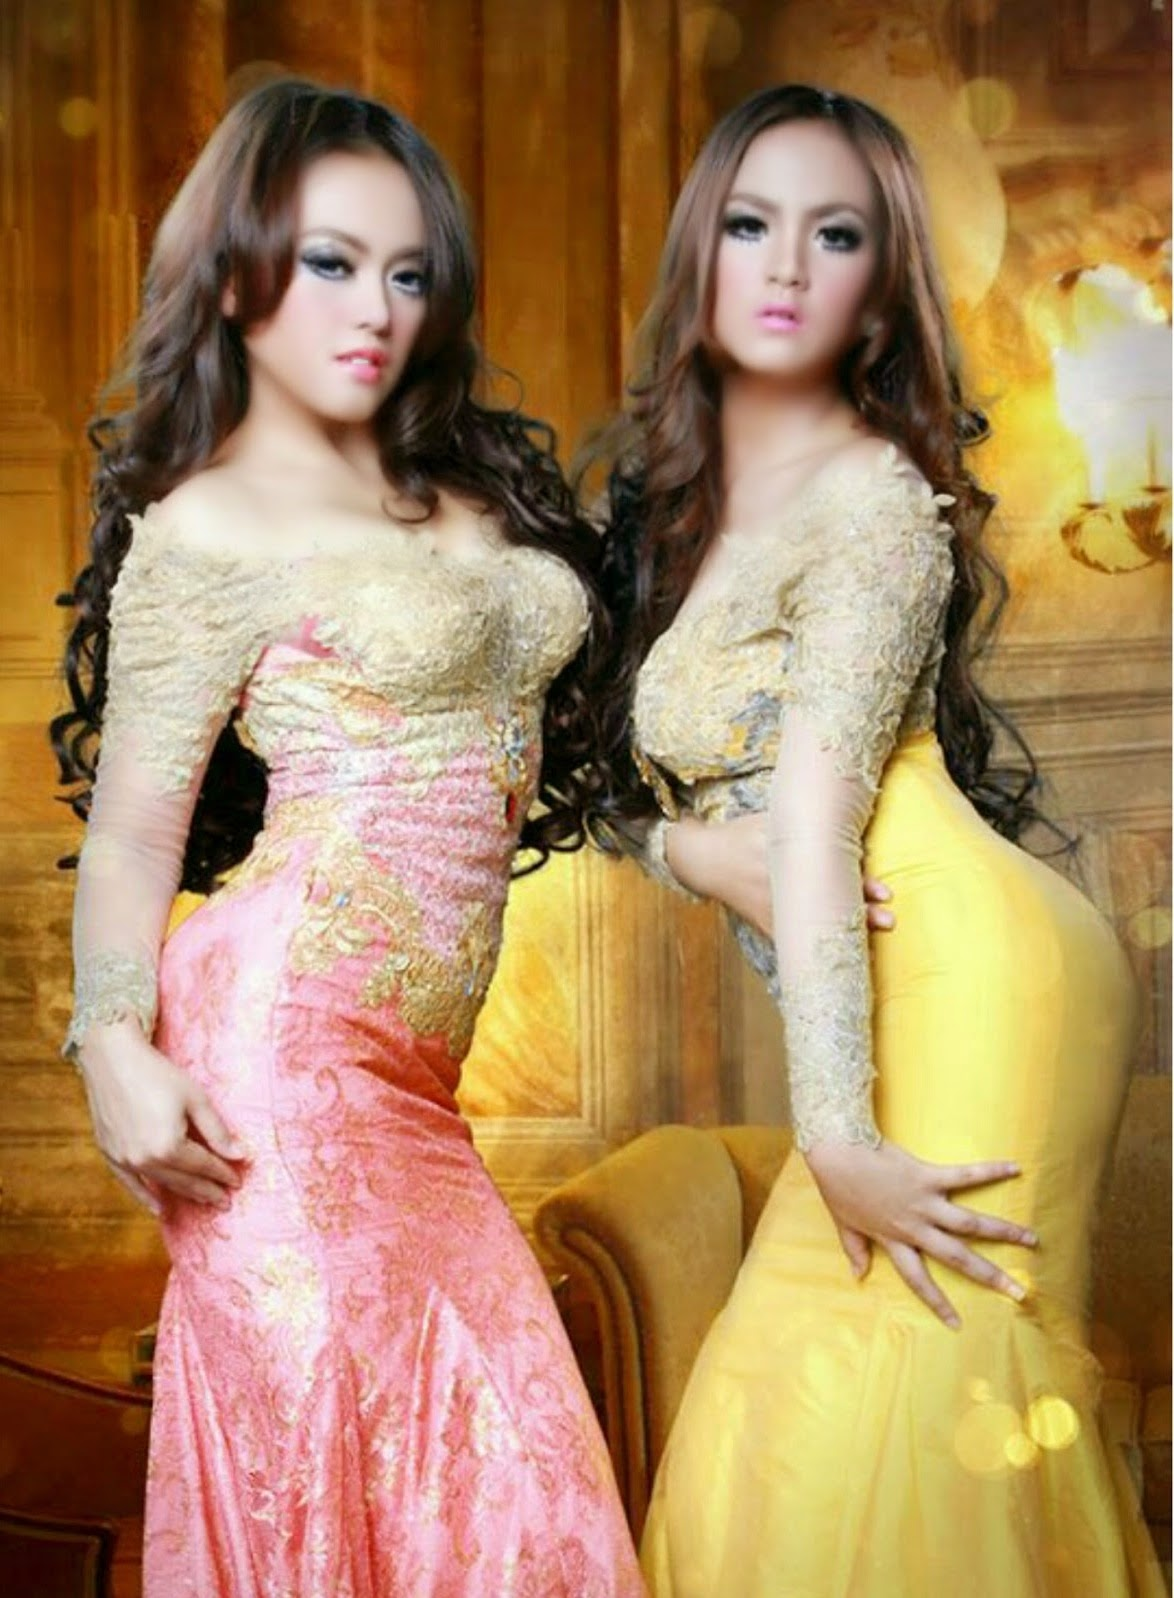 Foto Hot dan Kisah Berdirinya Duo Dangdut Cantik dan Seksi, Duo ...